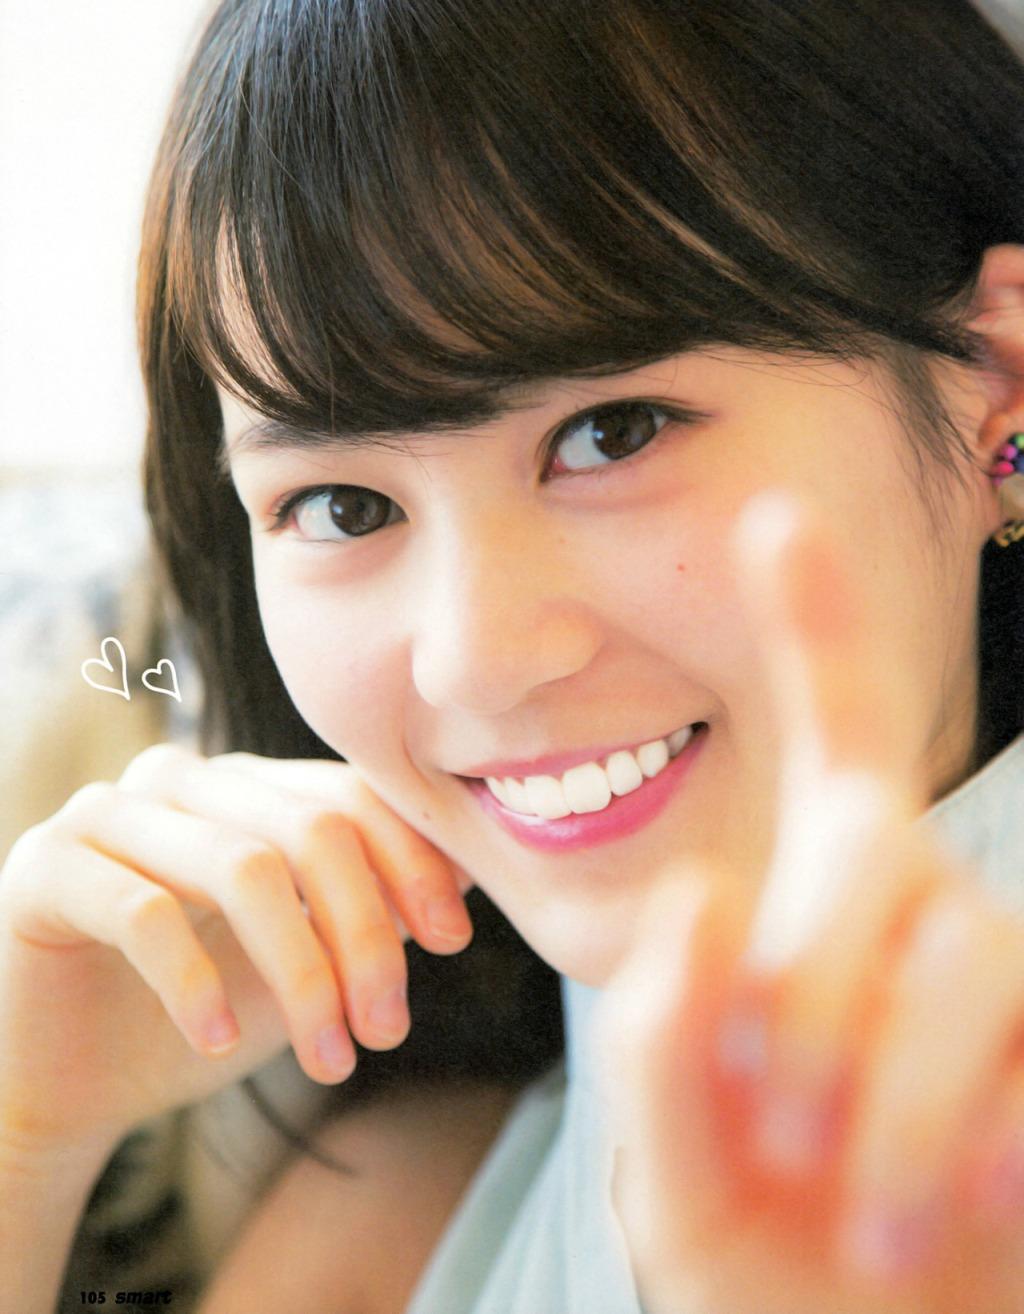 Ikuta Erika 生田絵梨花 Nogizaka48, Smart Magazine 2016 No.04-05